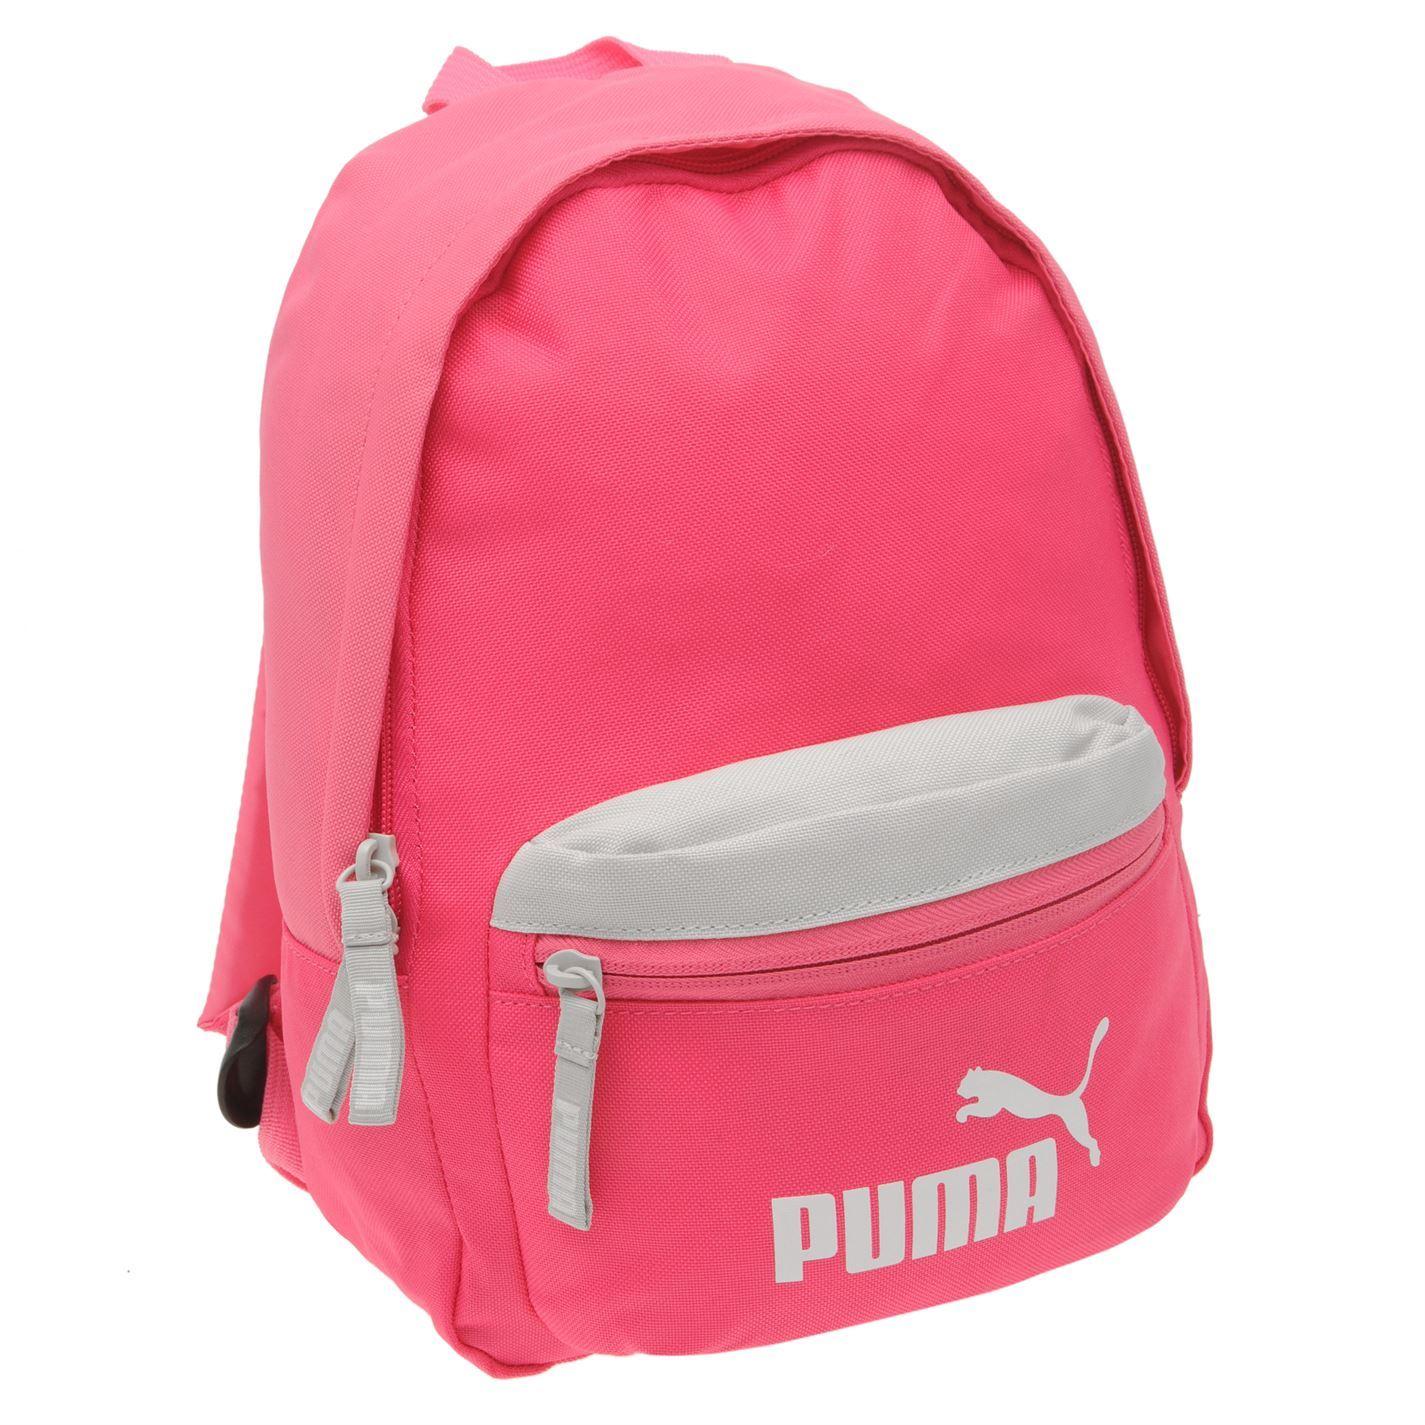 908ea1129f0b puma gym bag pink cheap   OFF63% Discounted